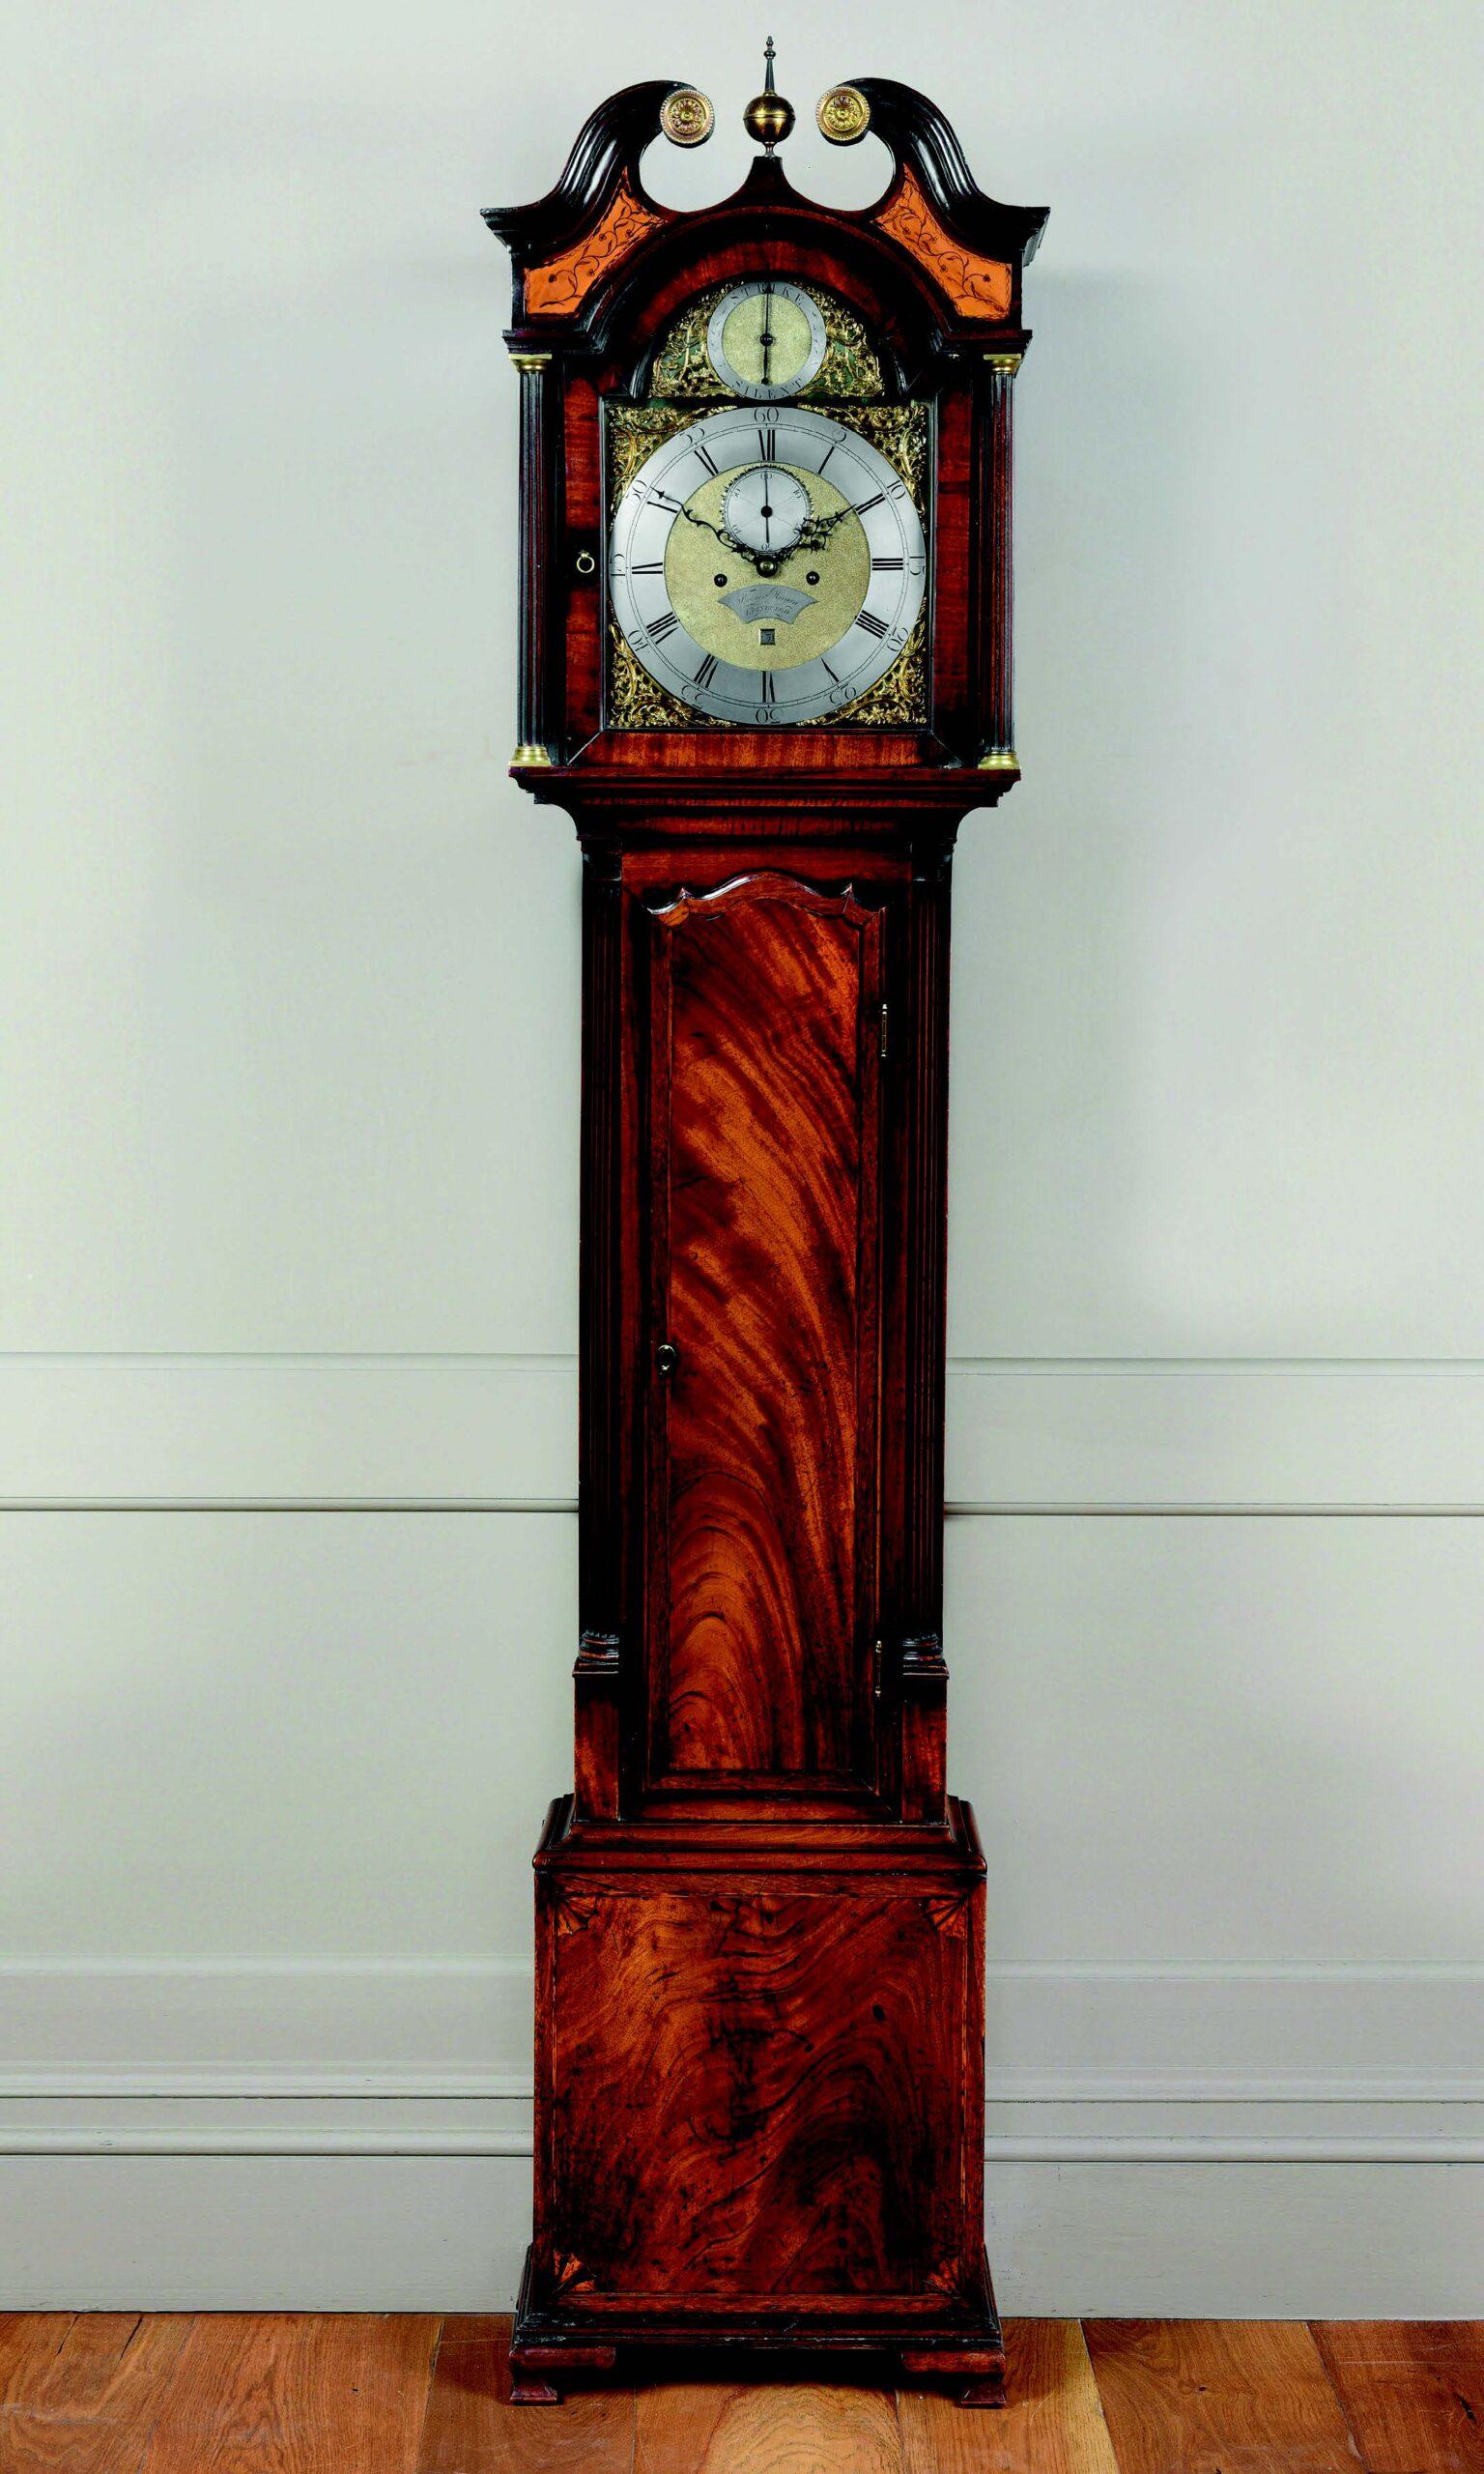 A classic 18th-century Edinburgh longcase antique clock